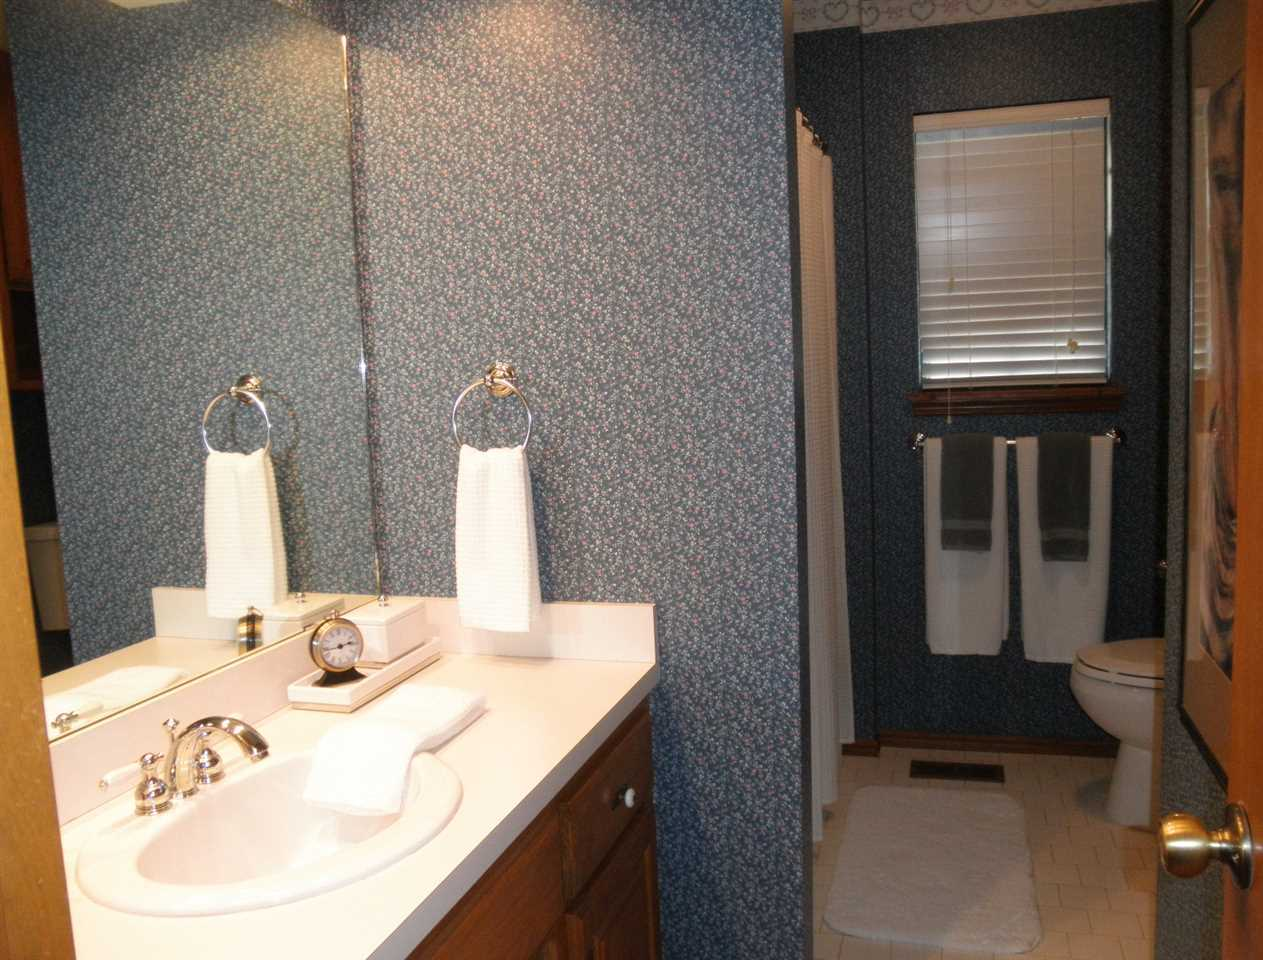 Sold Intraoffice W/MLS | 2800 Green Meadow Ponca City, OK 74604 20